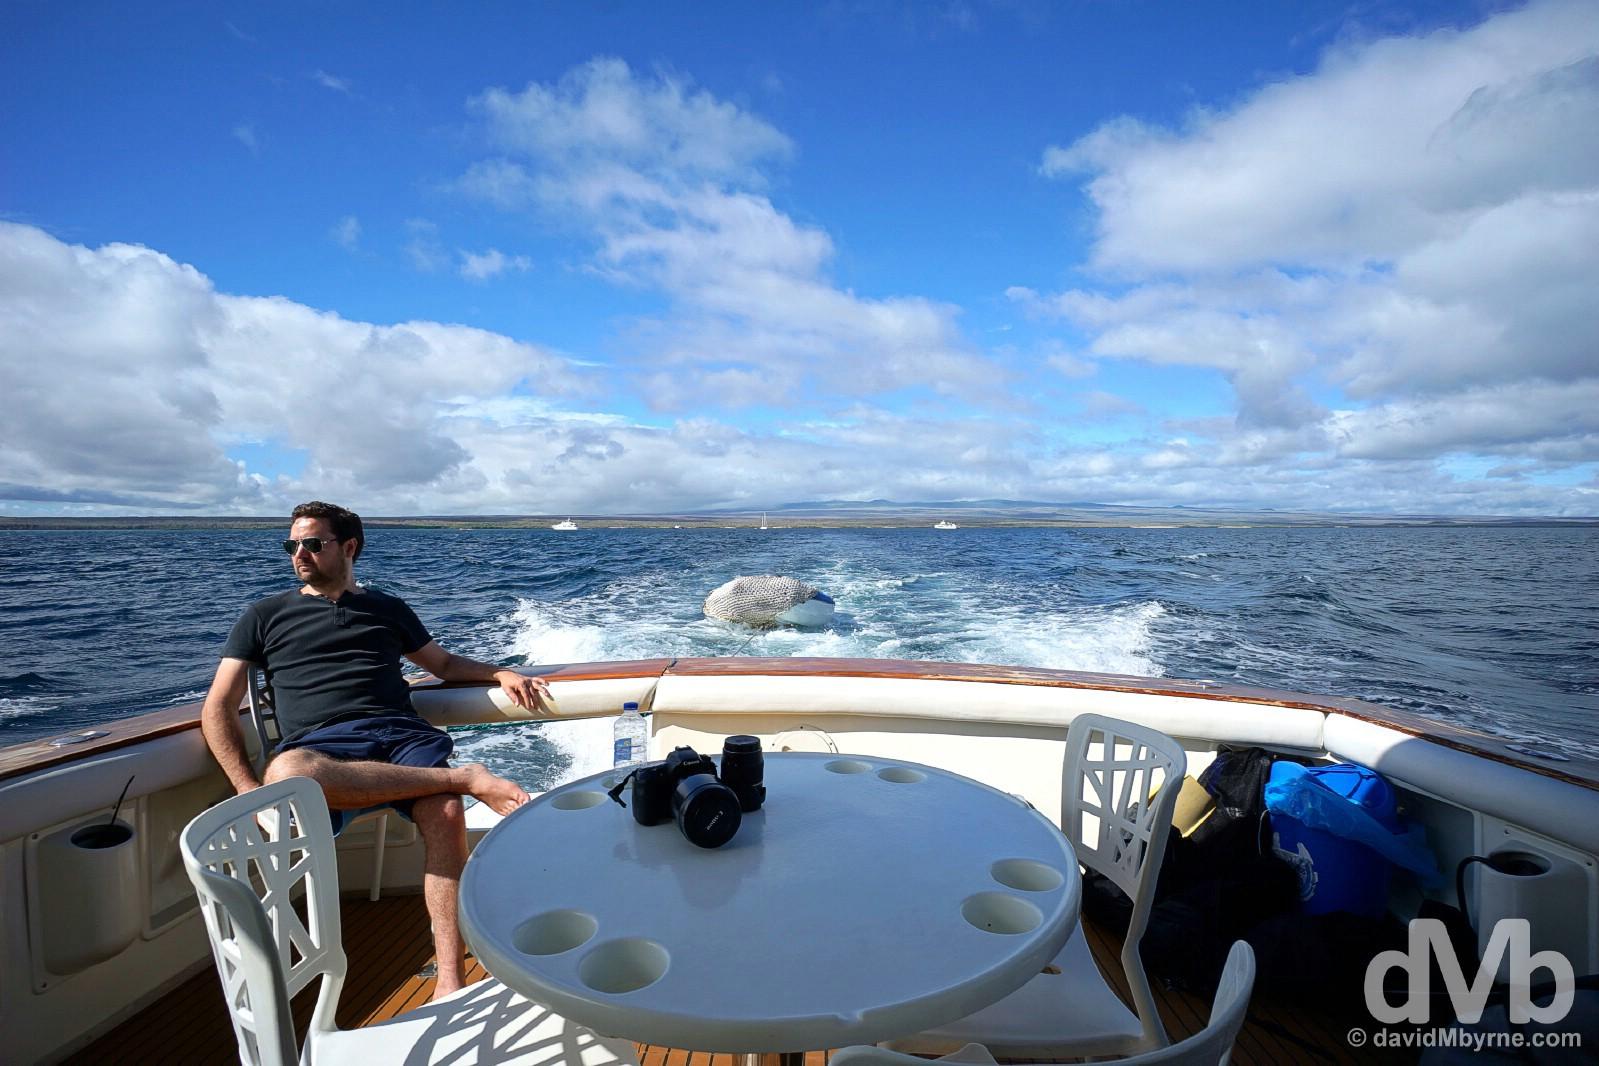 On board the Altamar en route from Isla Santa Cruz to Isla Seymour Norte. Galapagos, Ecuador. July 18, 2015.